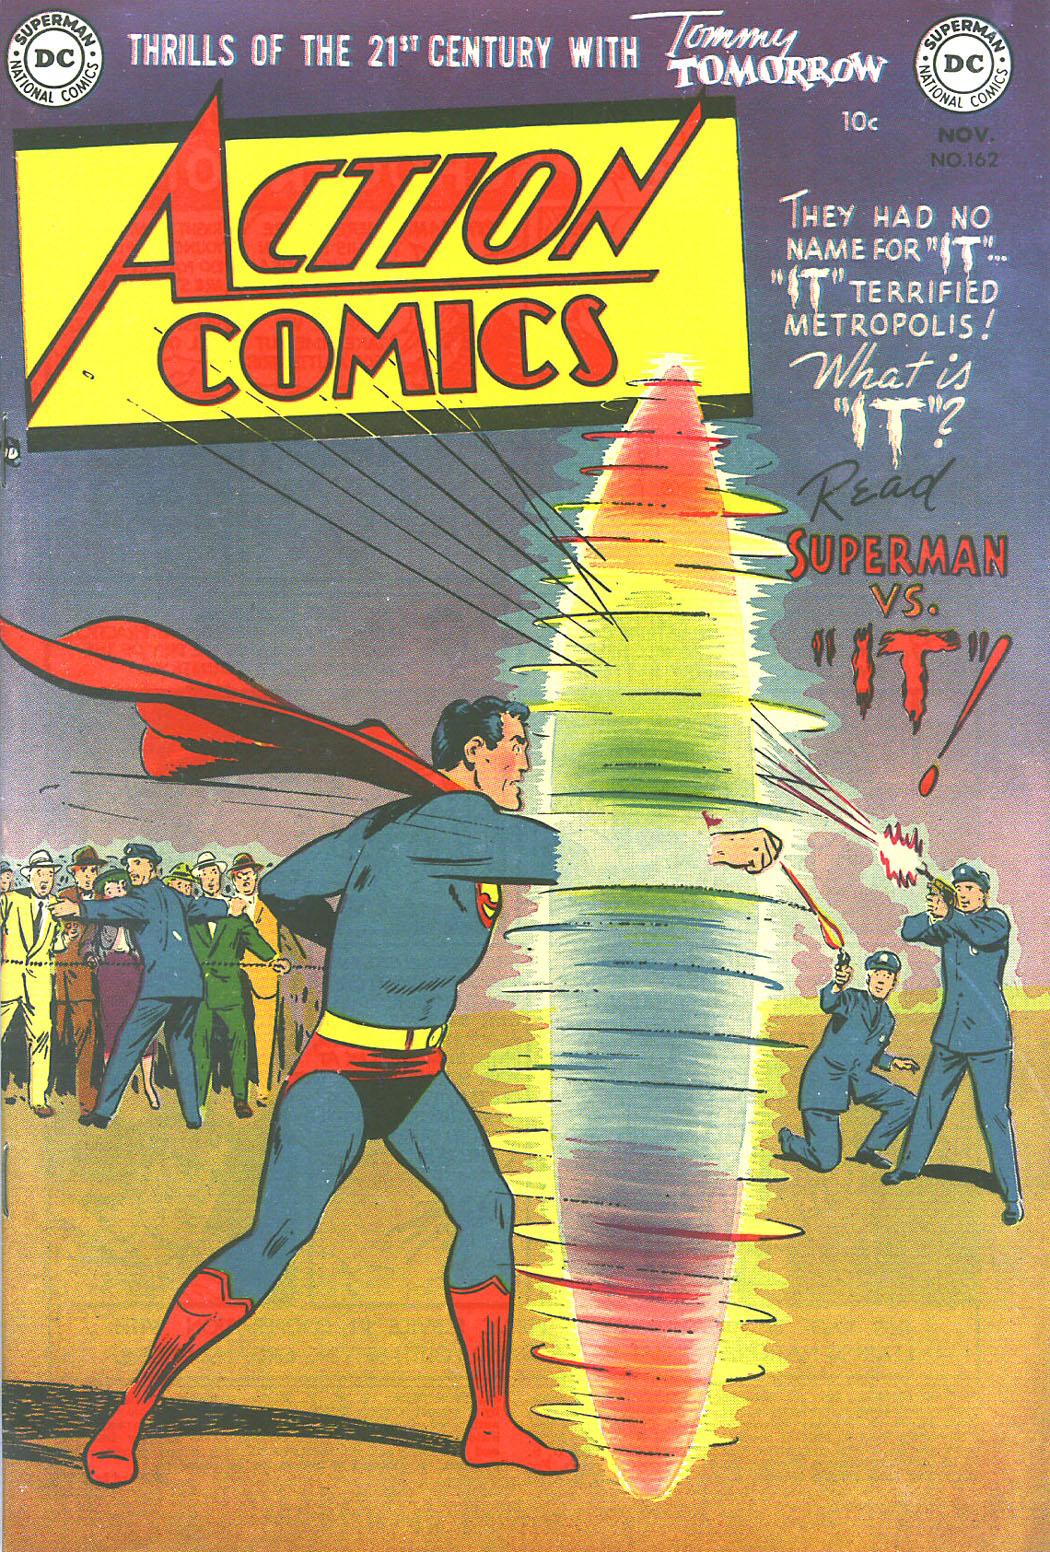 Action Comics (1938) 162 Page 1